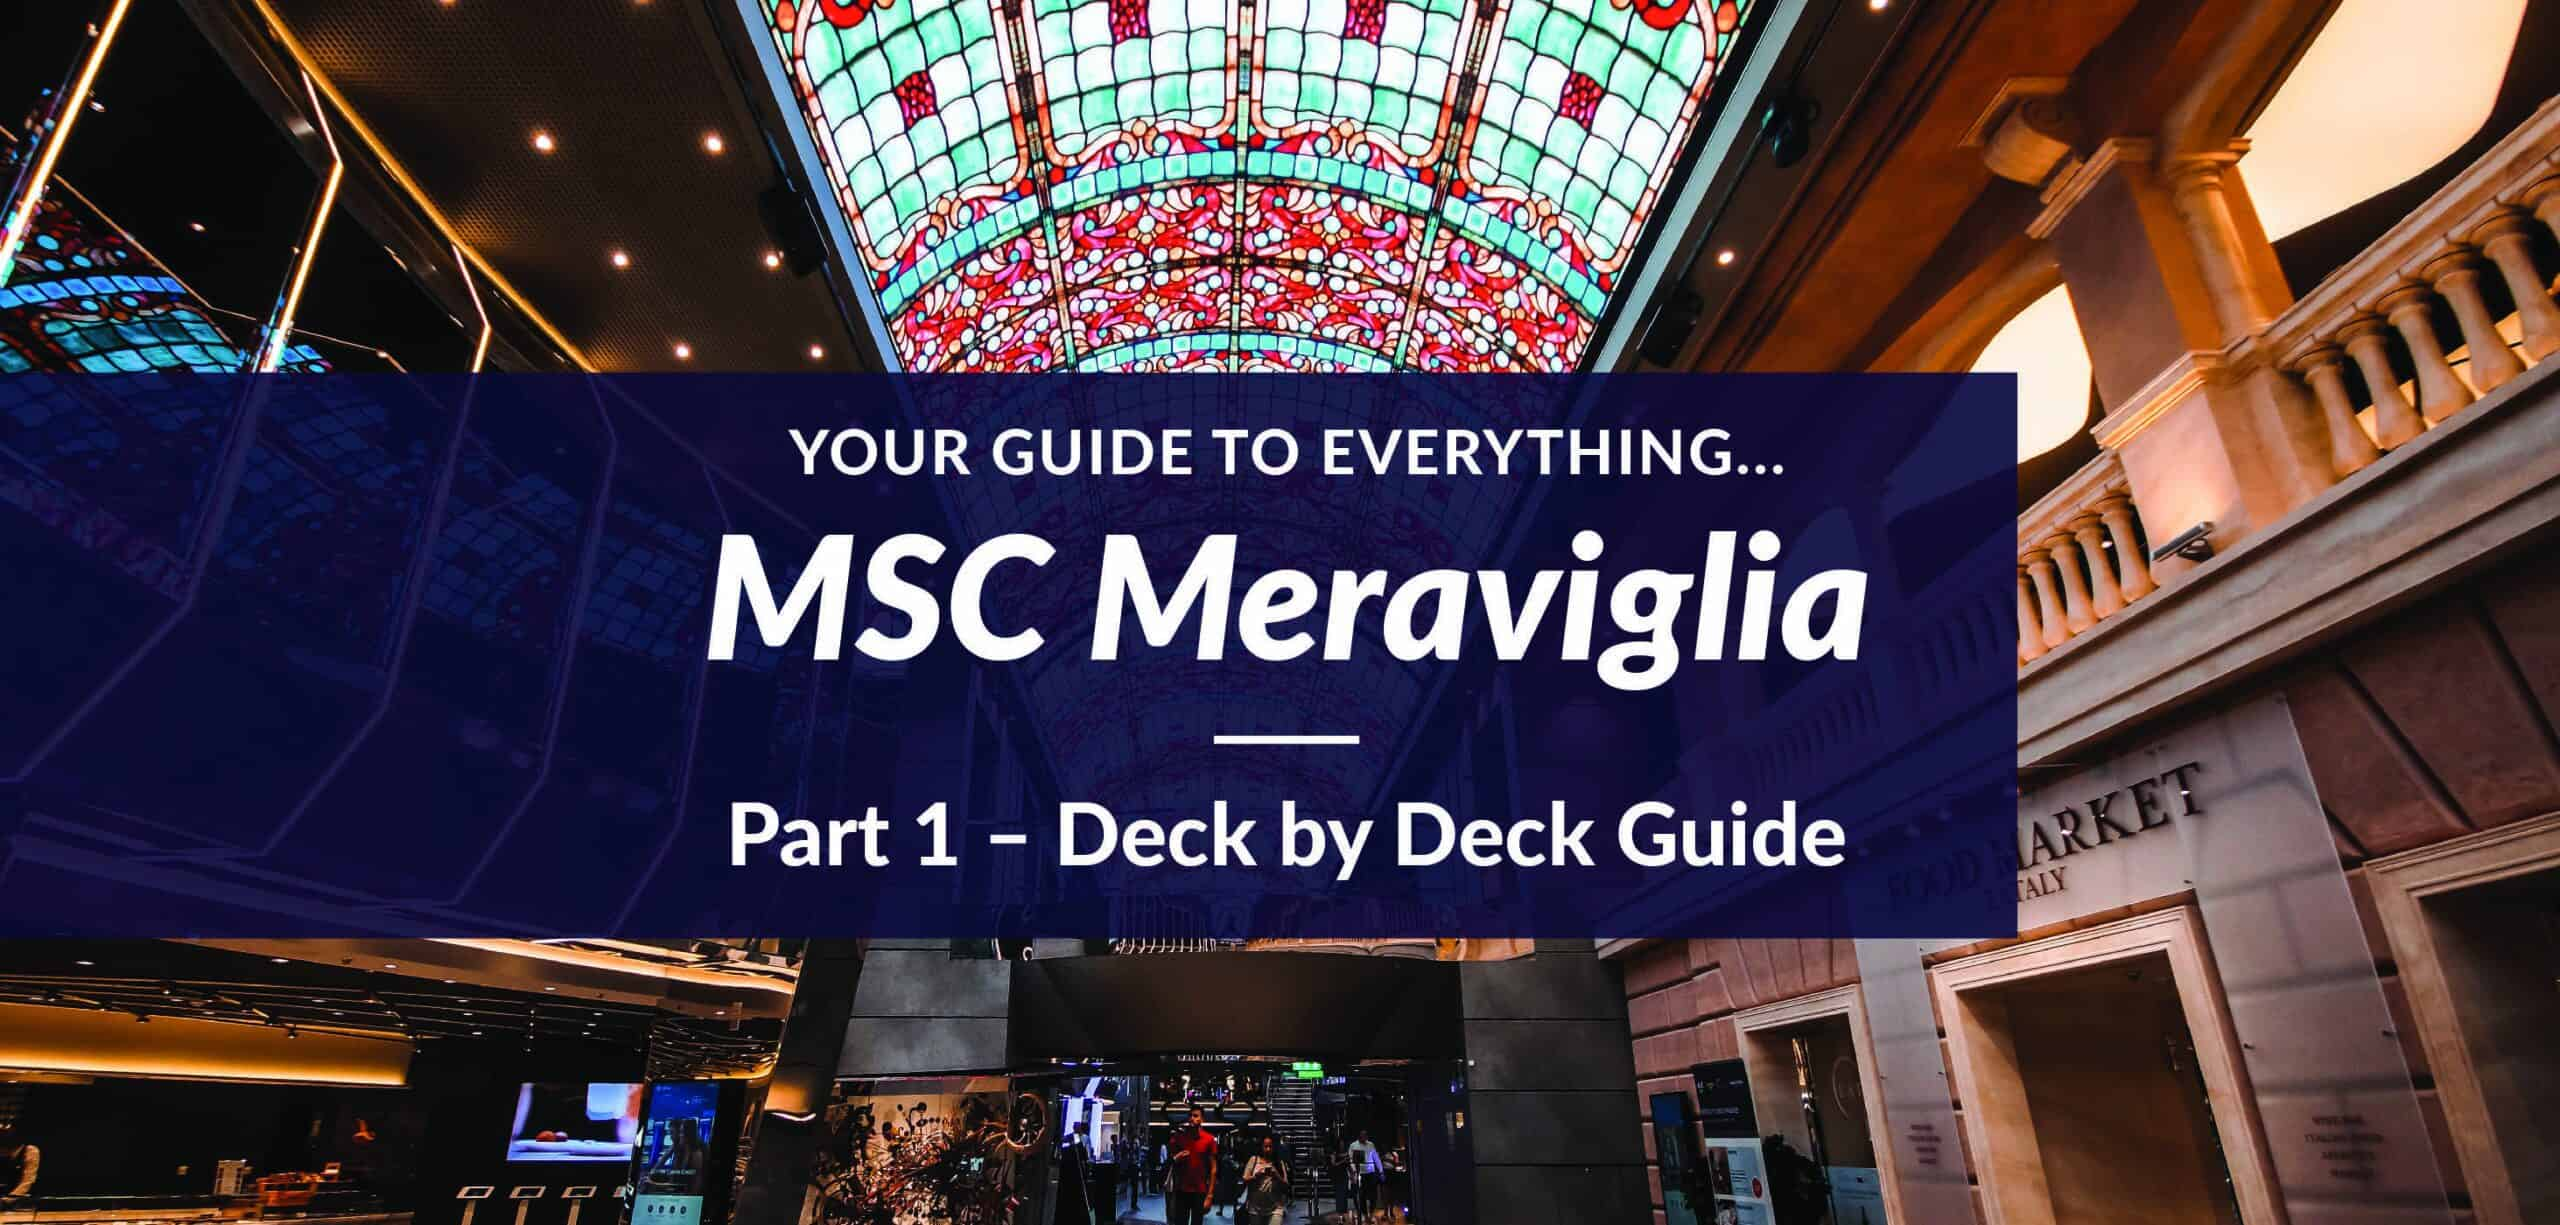 MSC Meraviglia - Part 1 - Deck by Deck Guide